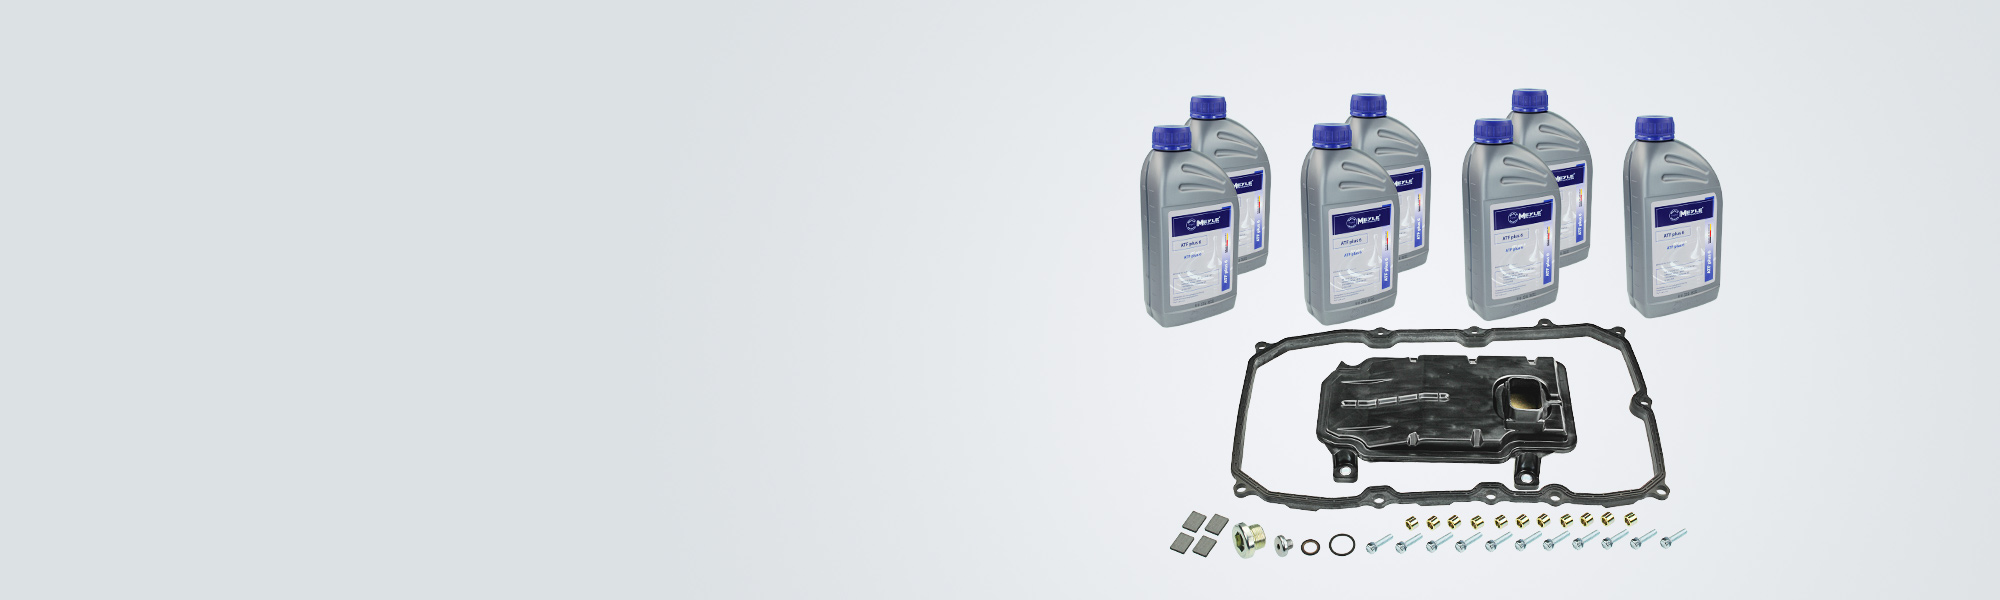 MEYLE oil change kits